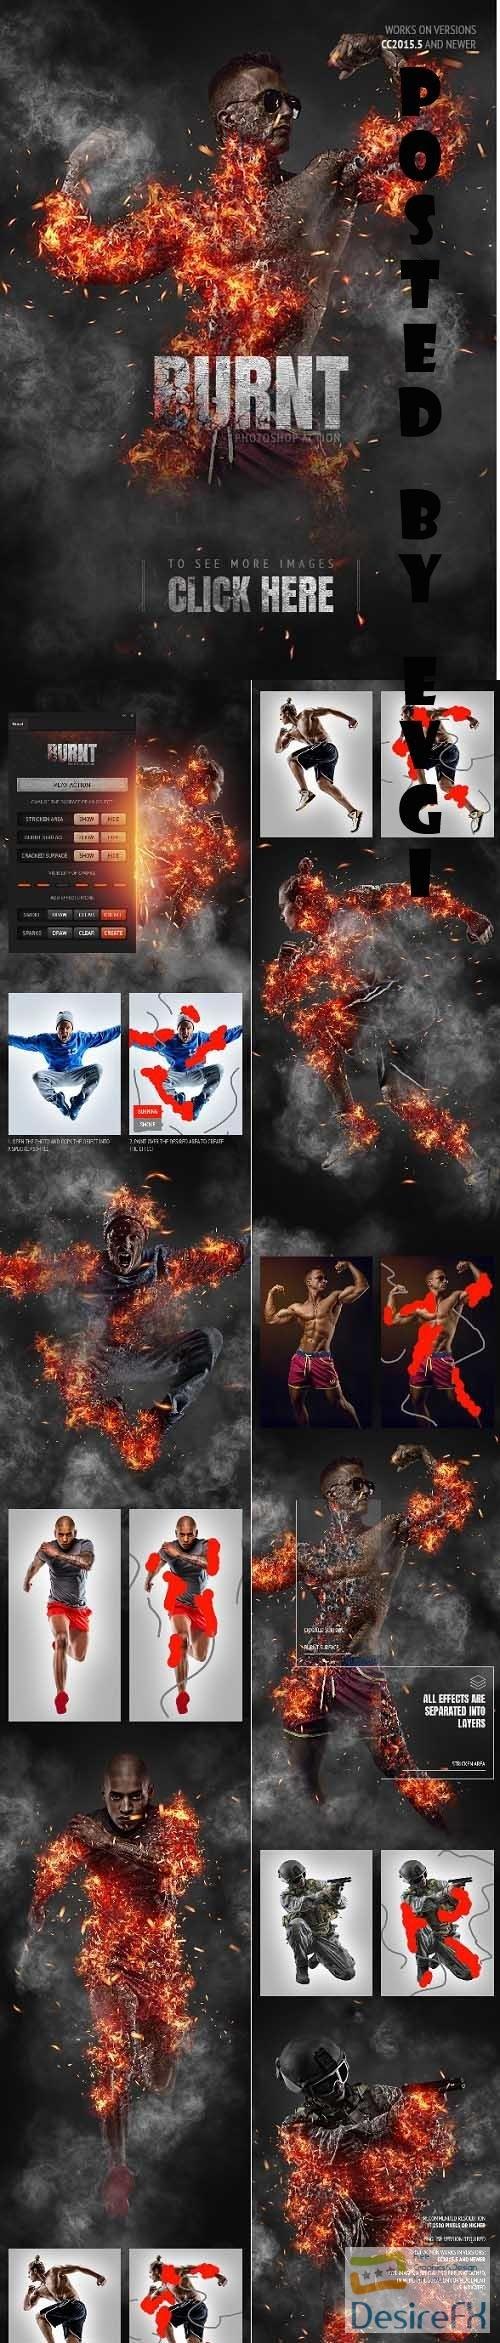 Burnt Photoshop Action - 31468697